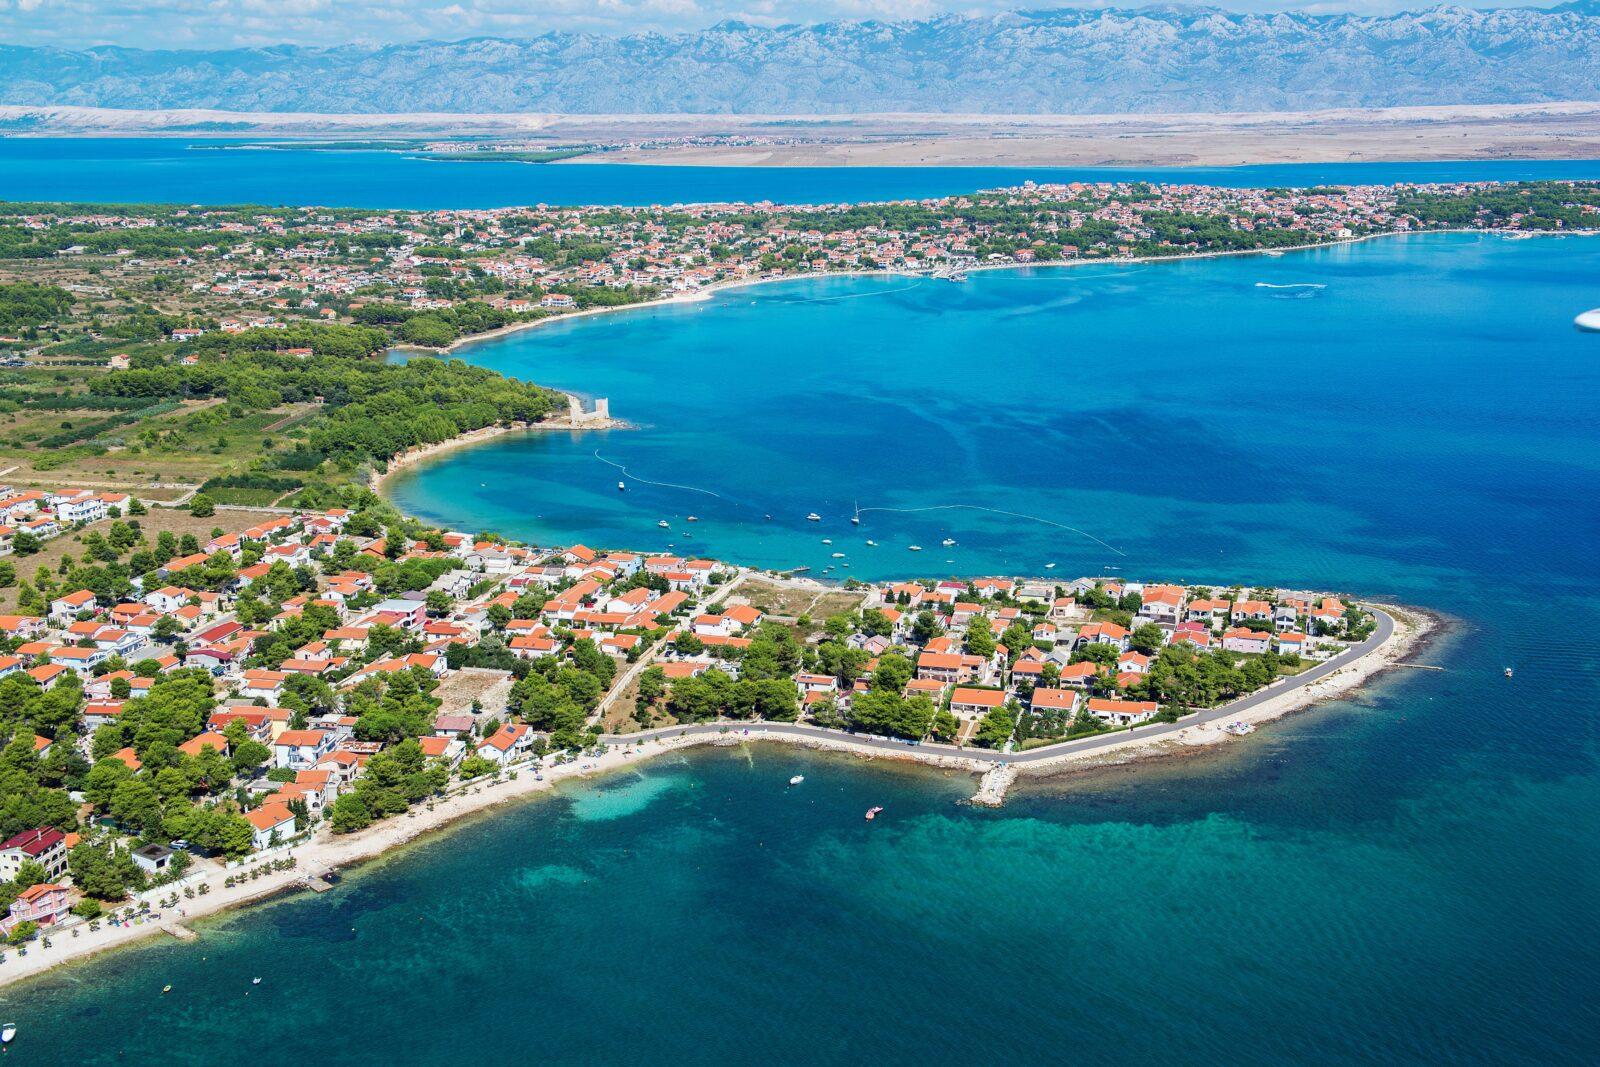 The Island of Vir, Croatia